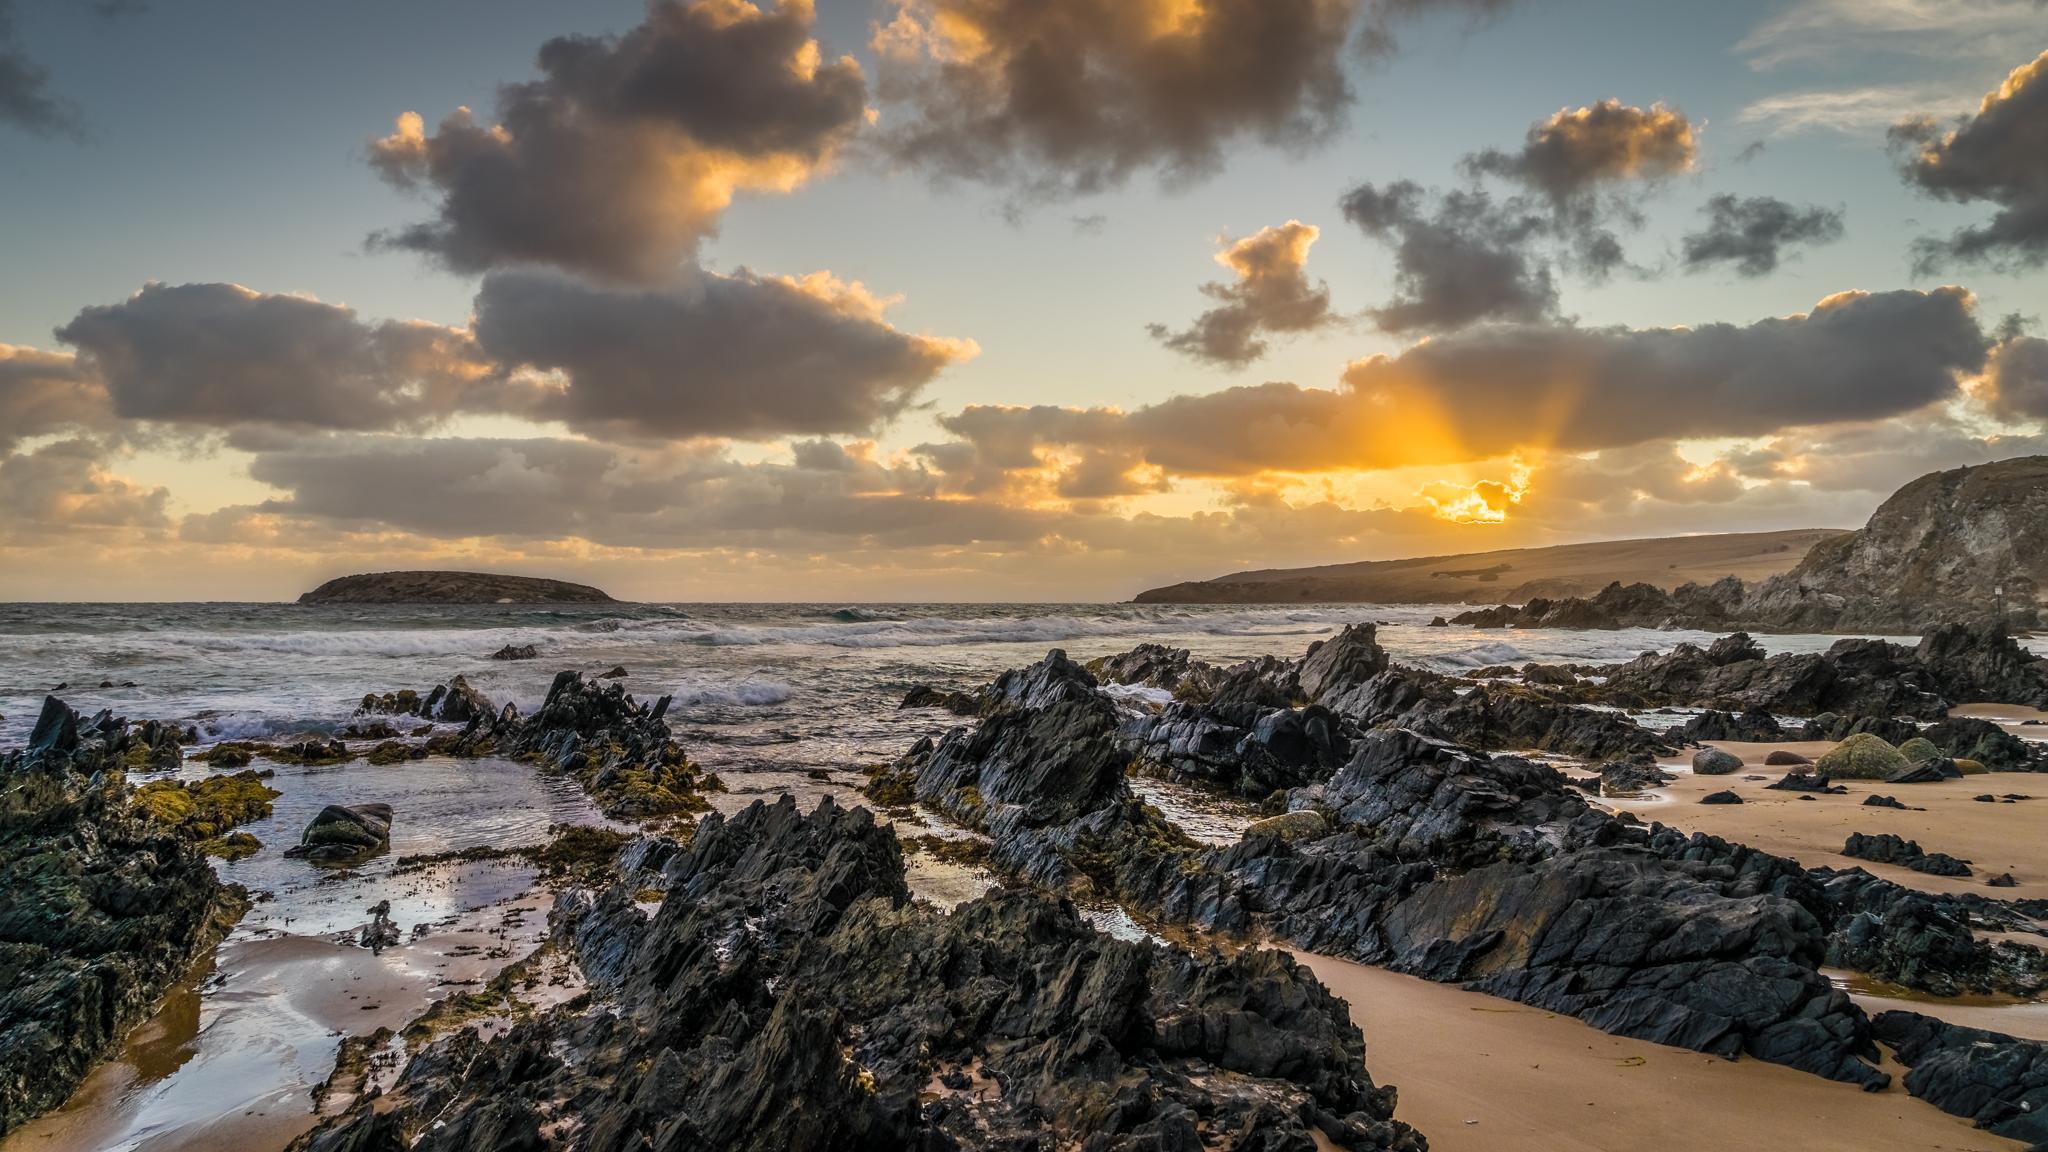 Petrel Cove Beach, Victor Harbor, Australia